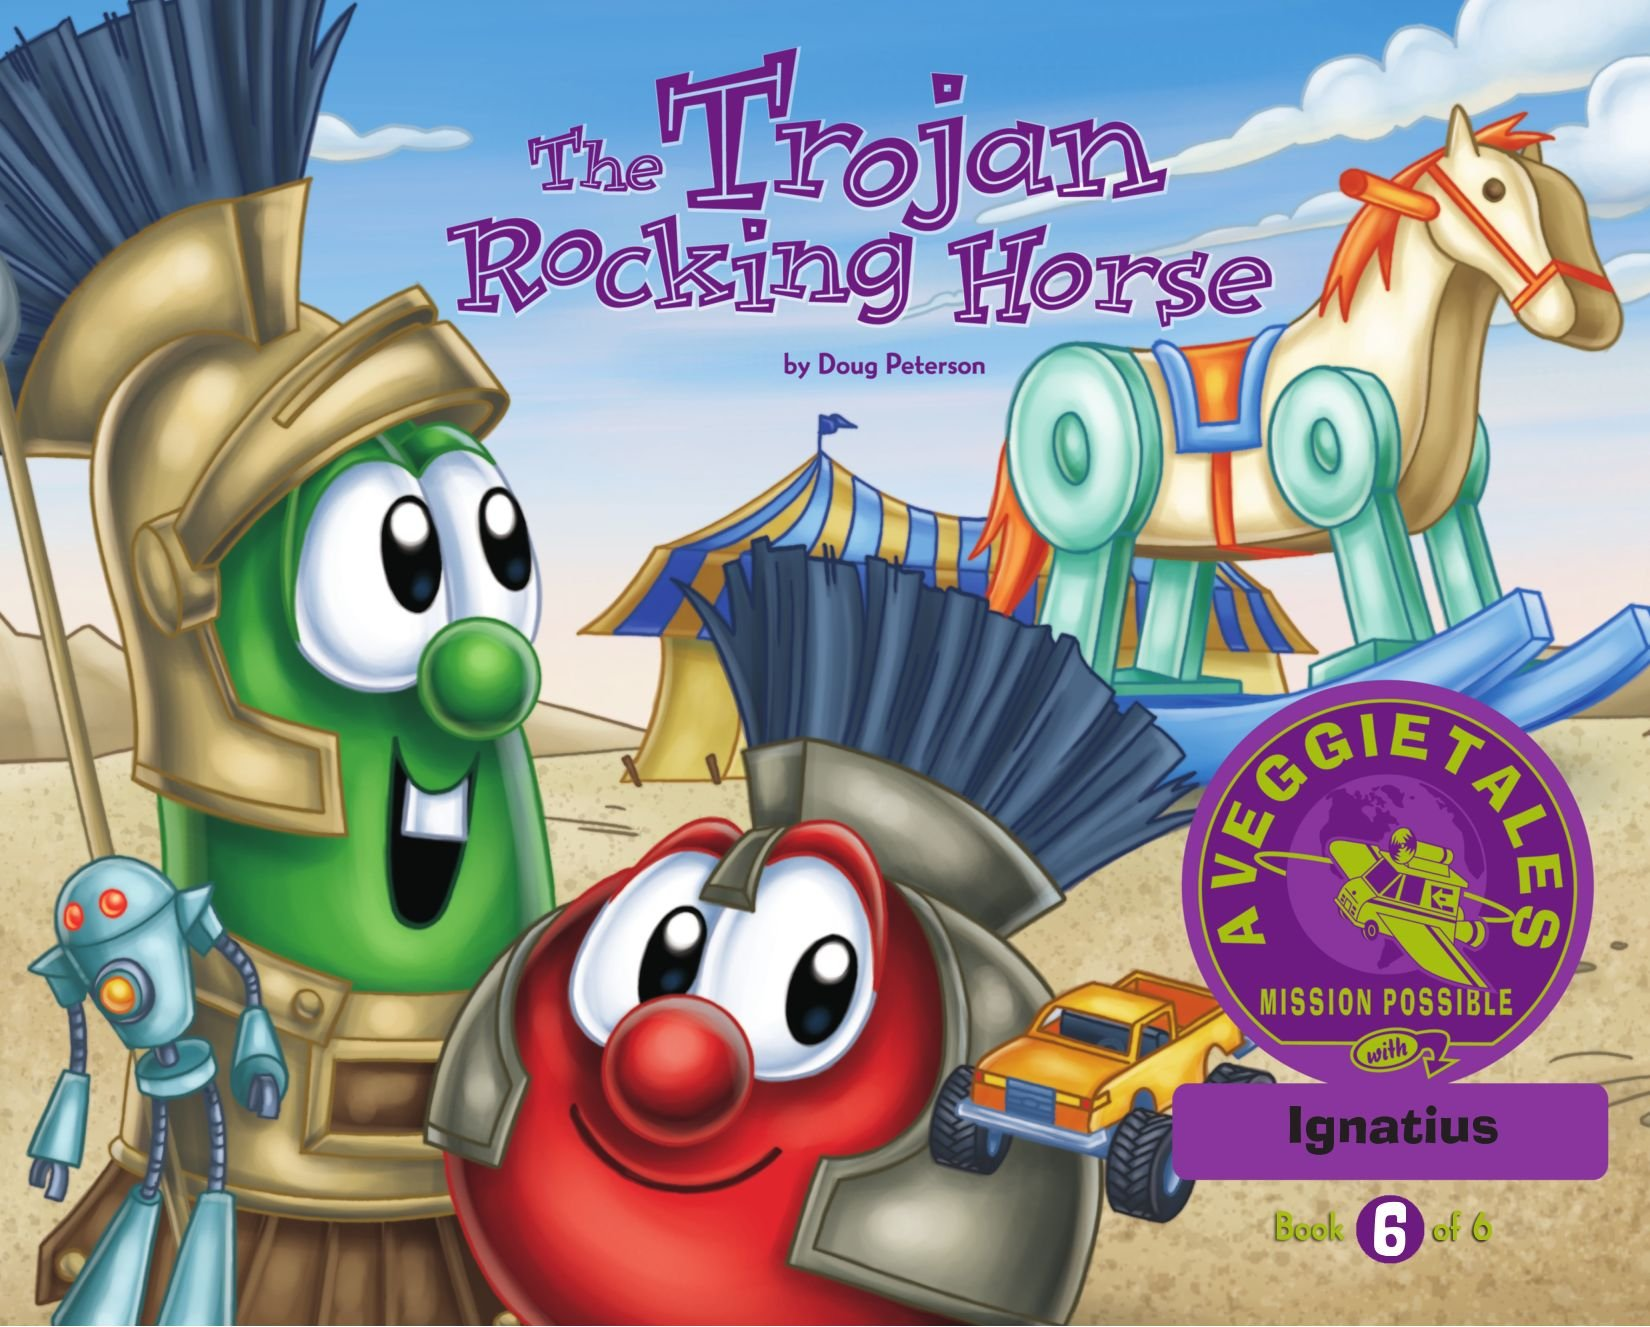 The Trojan Rocking Horse - VeggieTales Mission Possible Adventure Series #6: Personalized for Ignatius (Boy) pdf epub